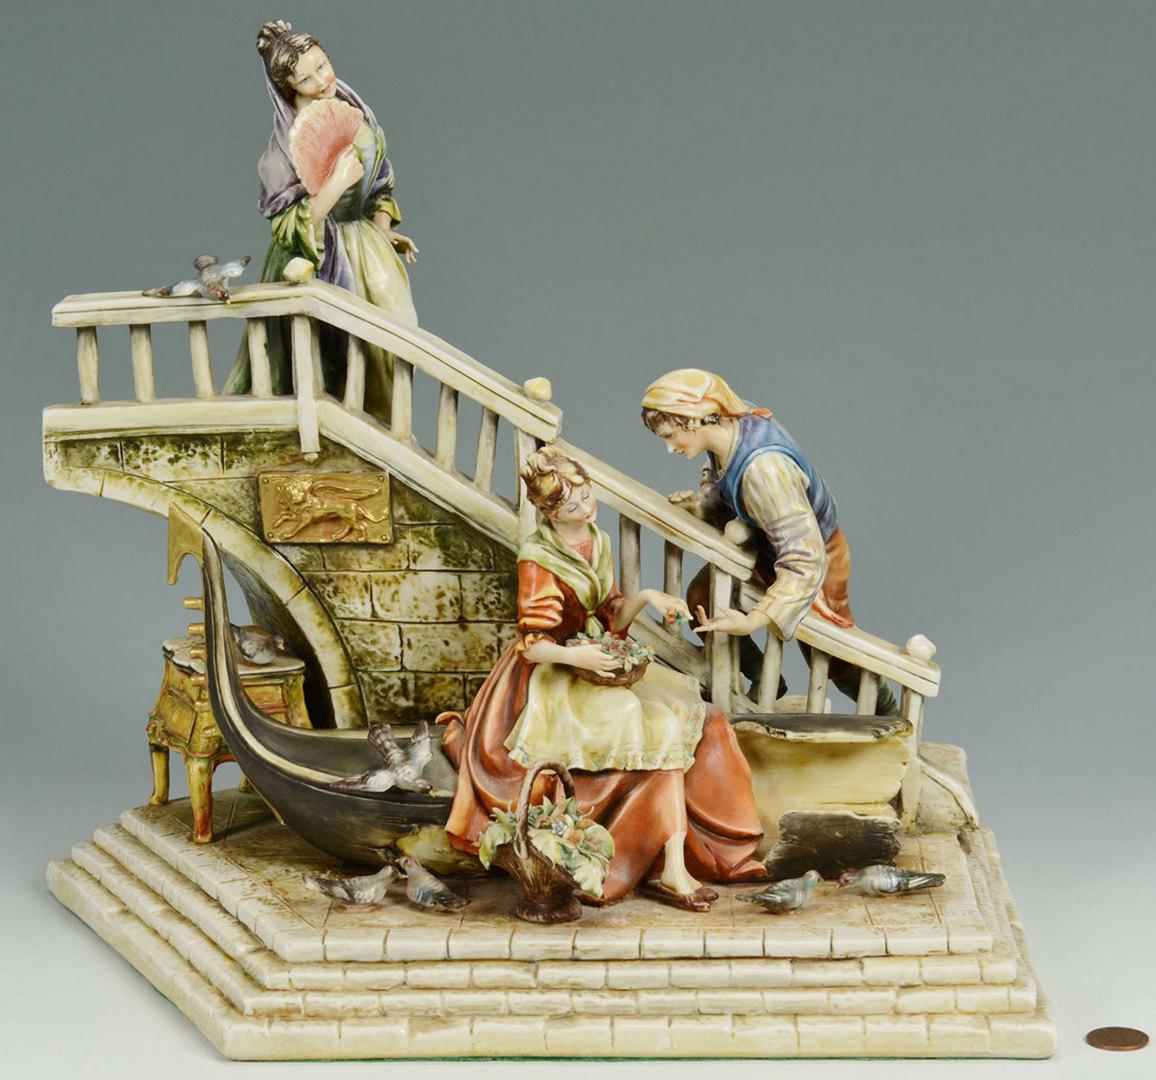 Lot 563: Two (2) Antonio Borsato Figural Groupings